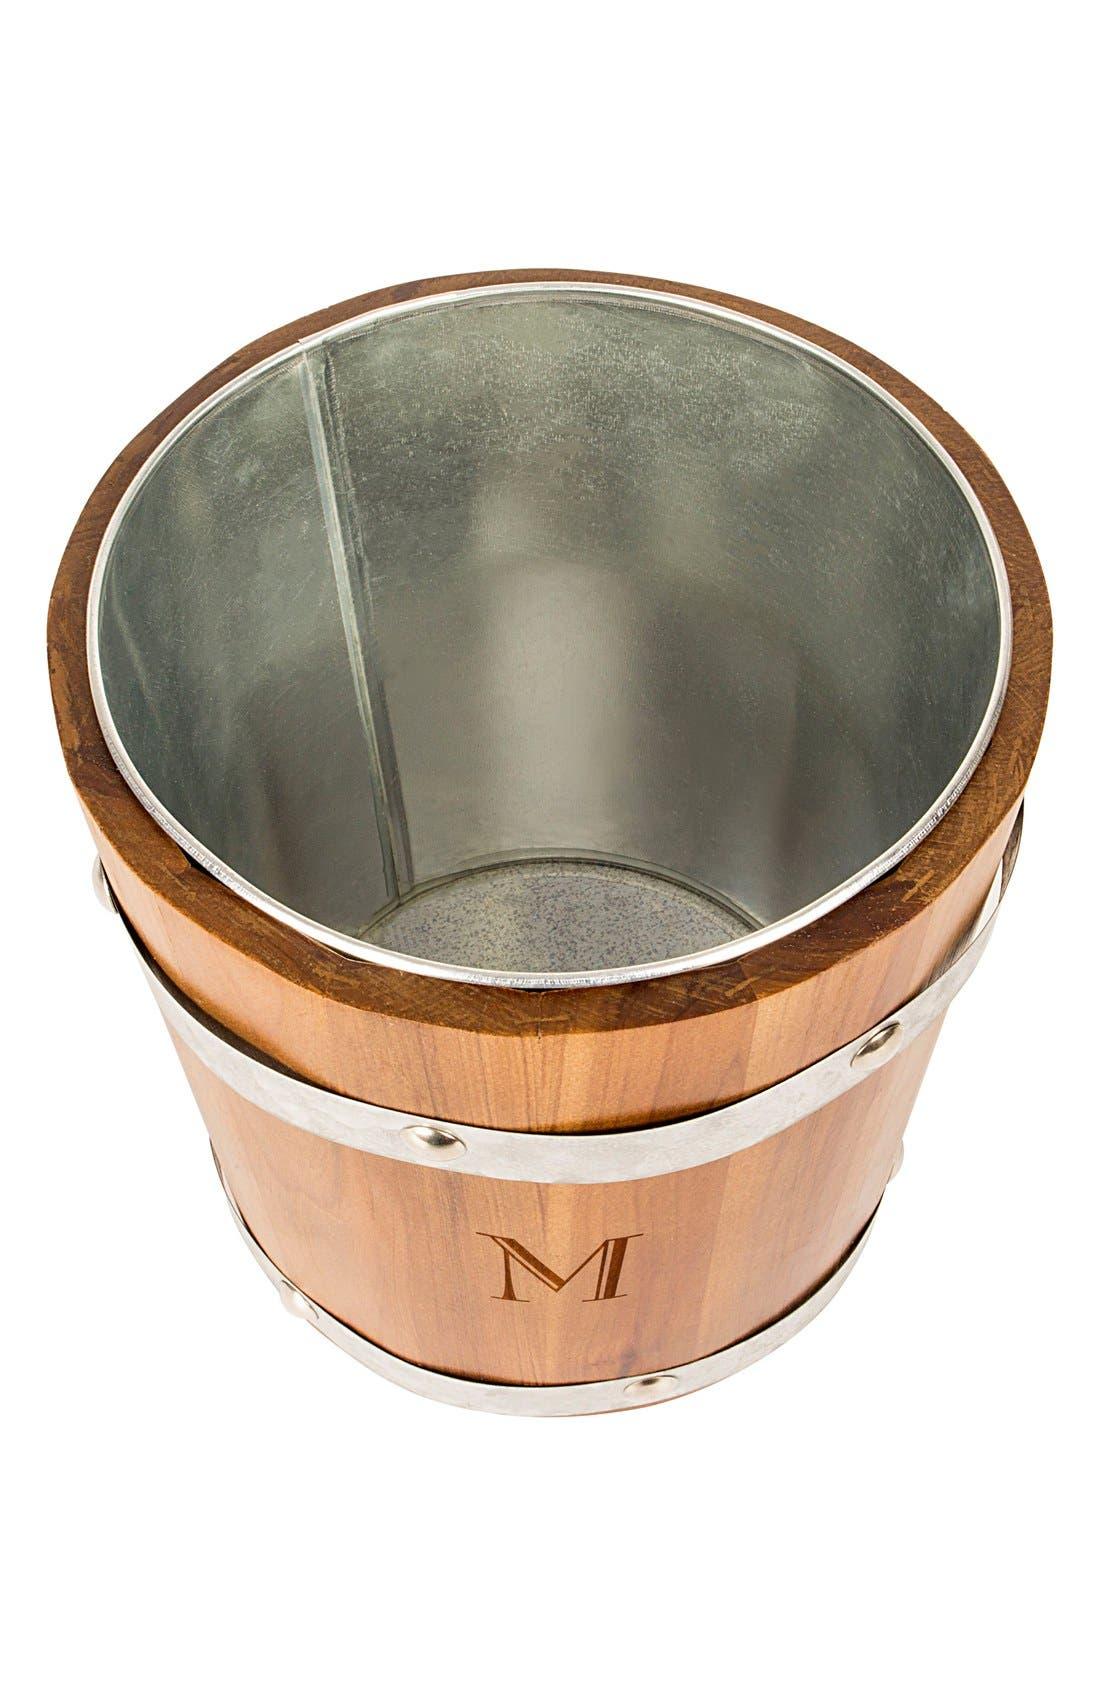 Rustic Monogram Ice Bucket,                             Alternate thumbnail 2, color,                             200